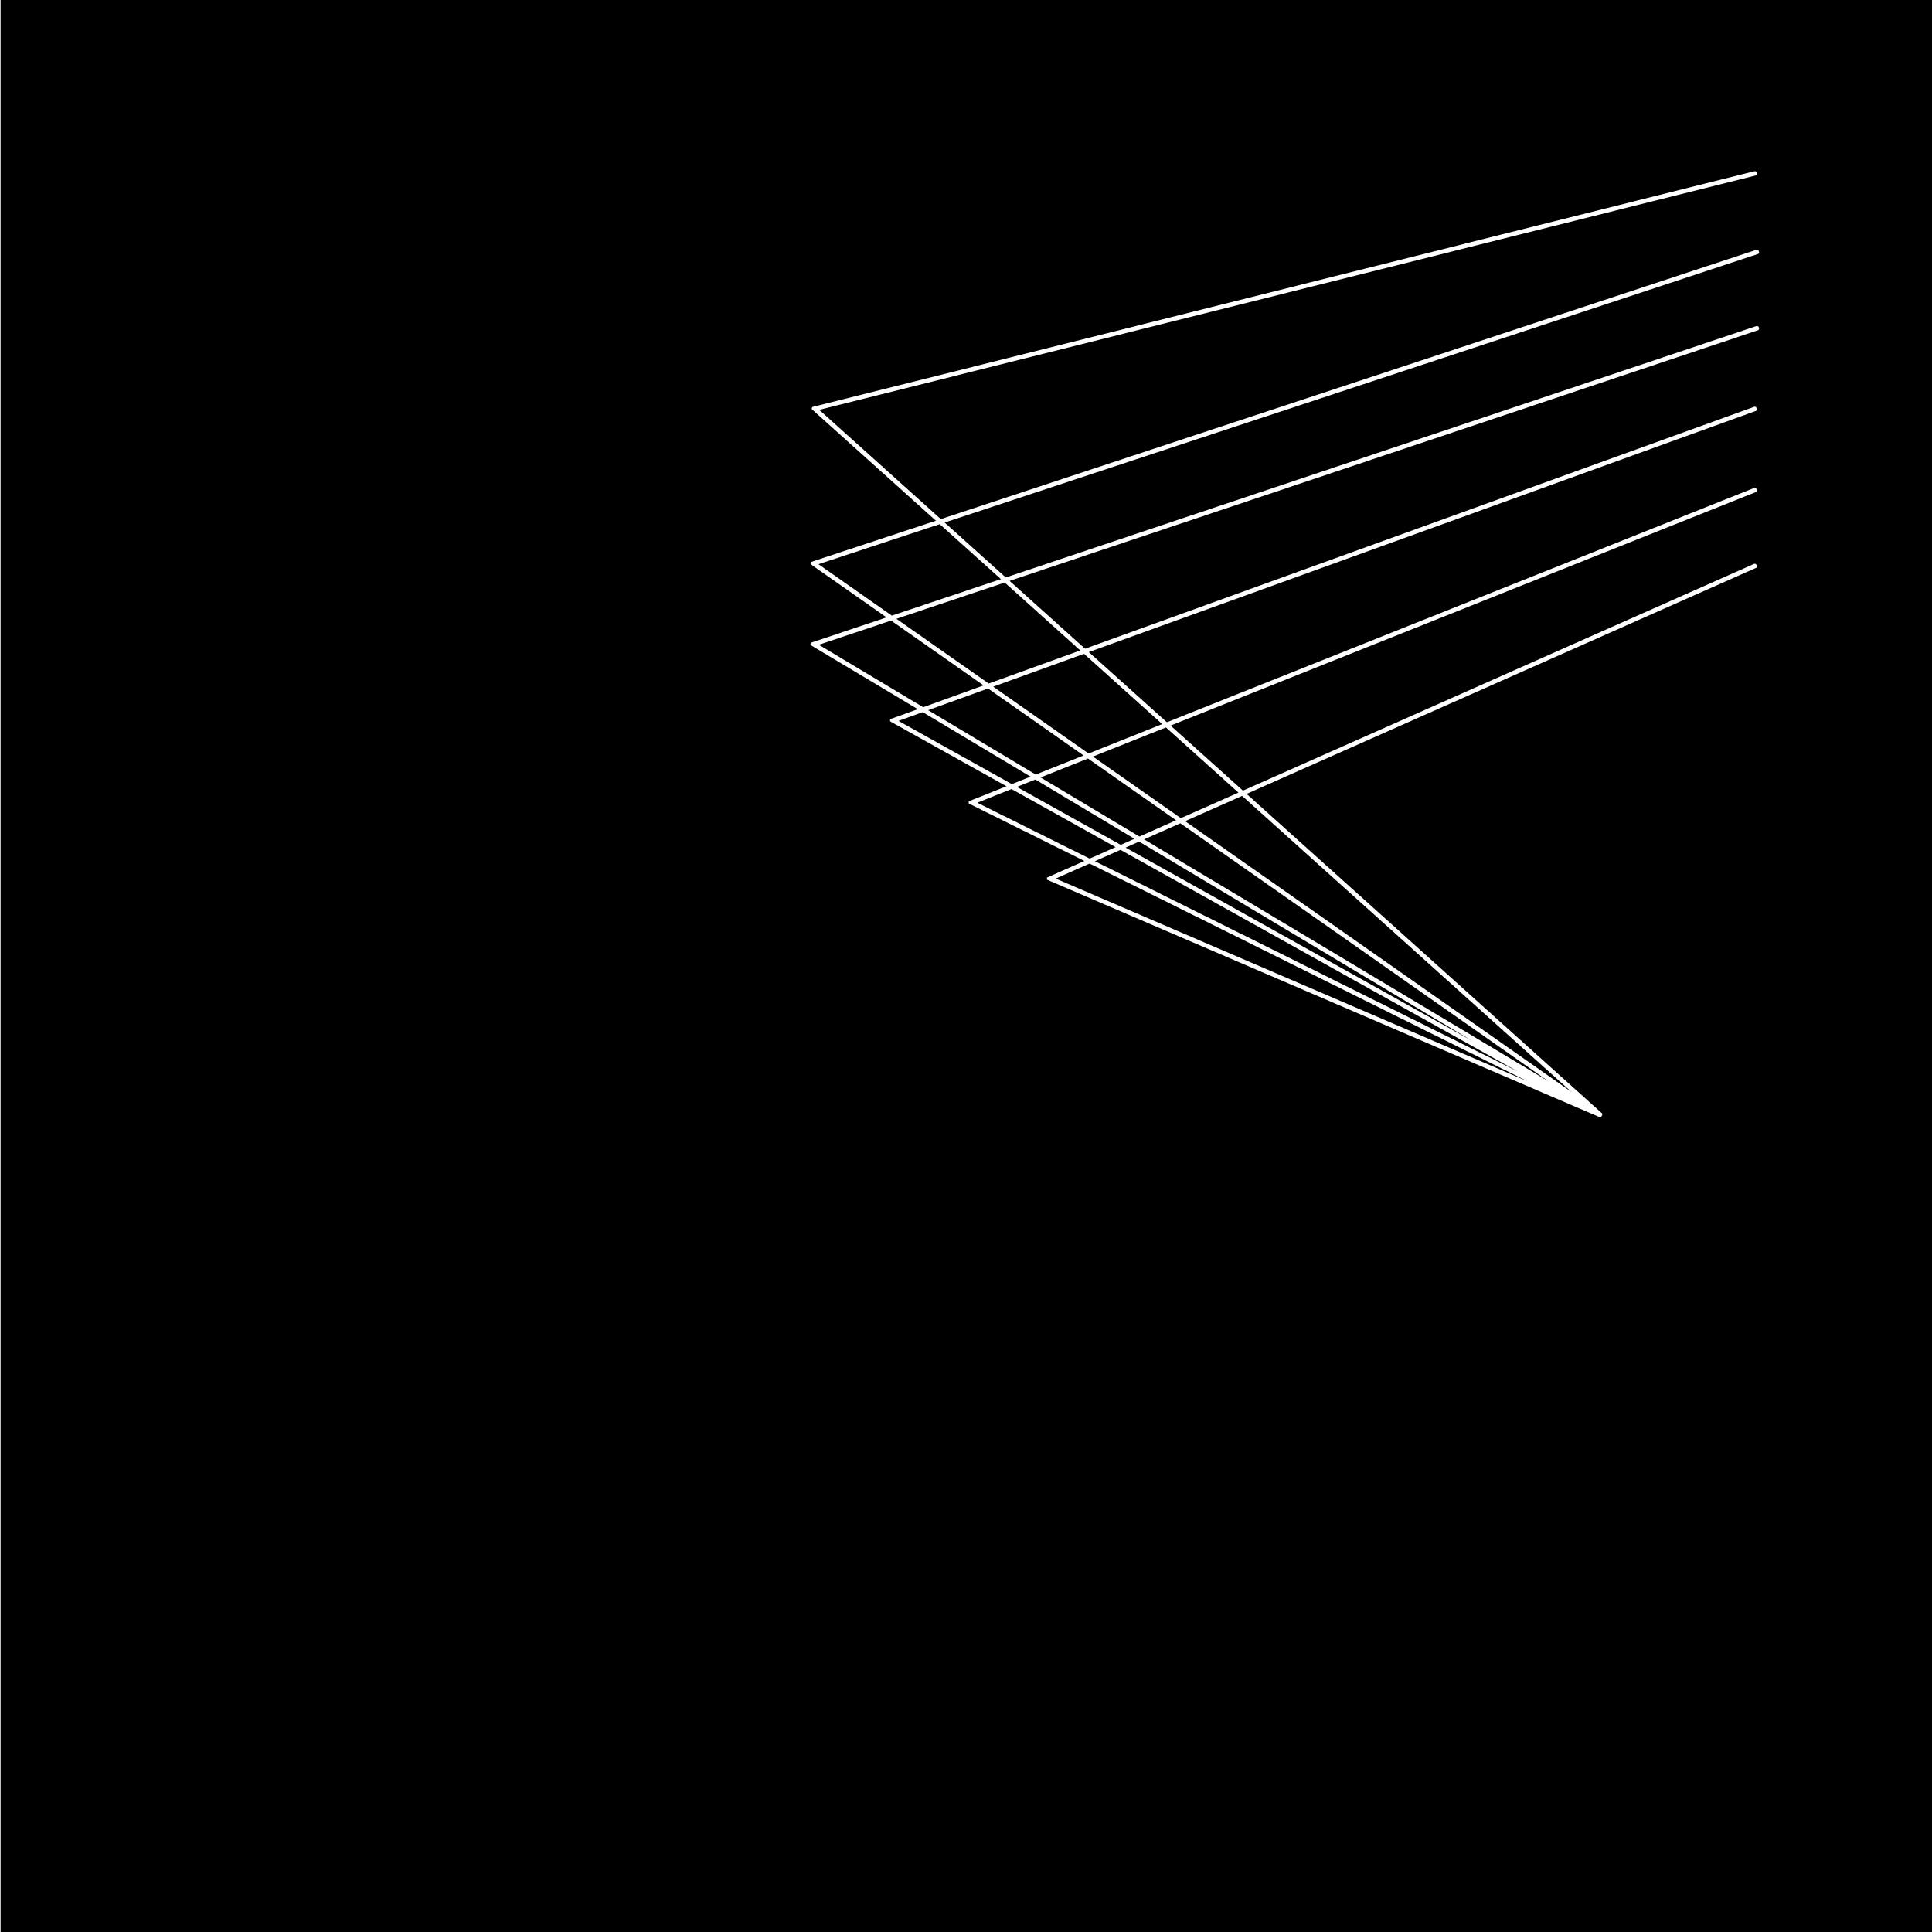 Nicolas Bernier — frequencies (sound quanta)